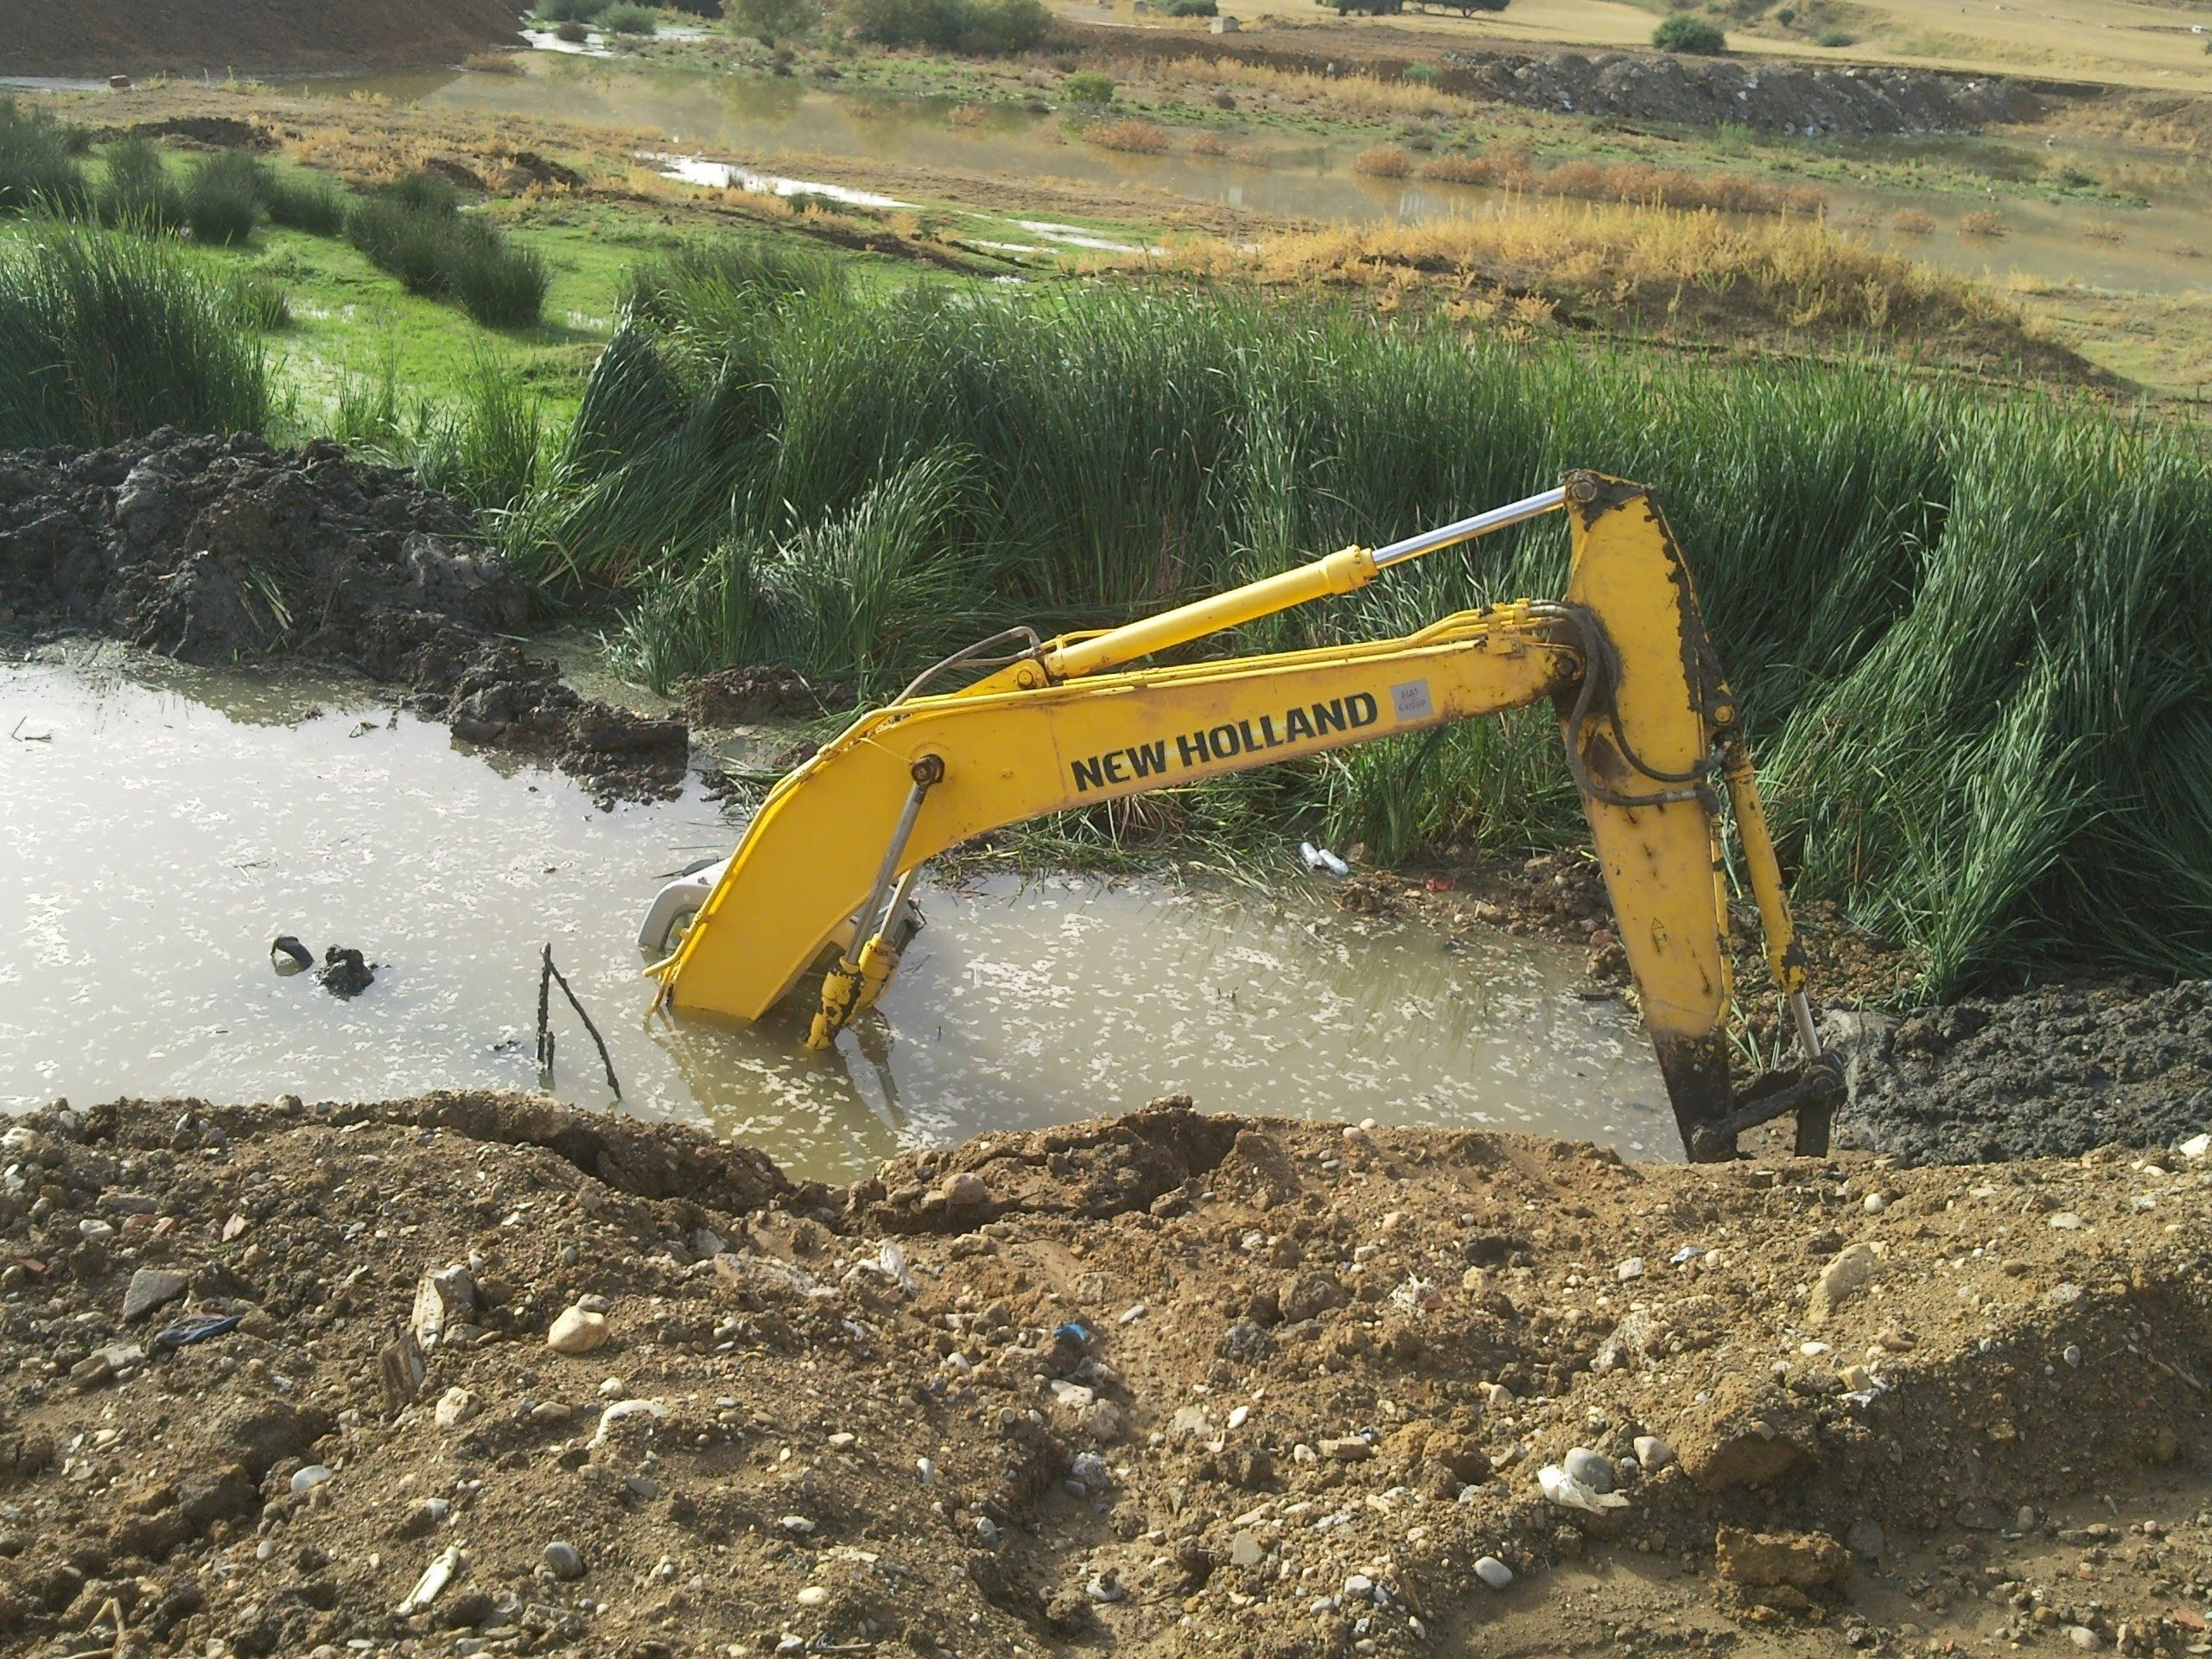 Incredible Excavator Rescue Truck Stuck in Deep Mud